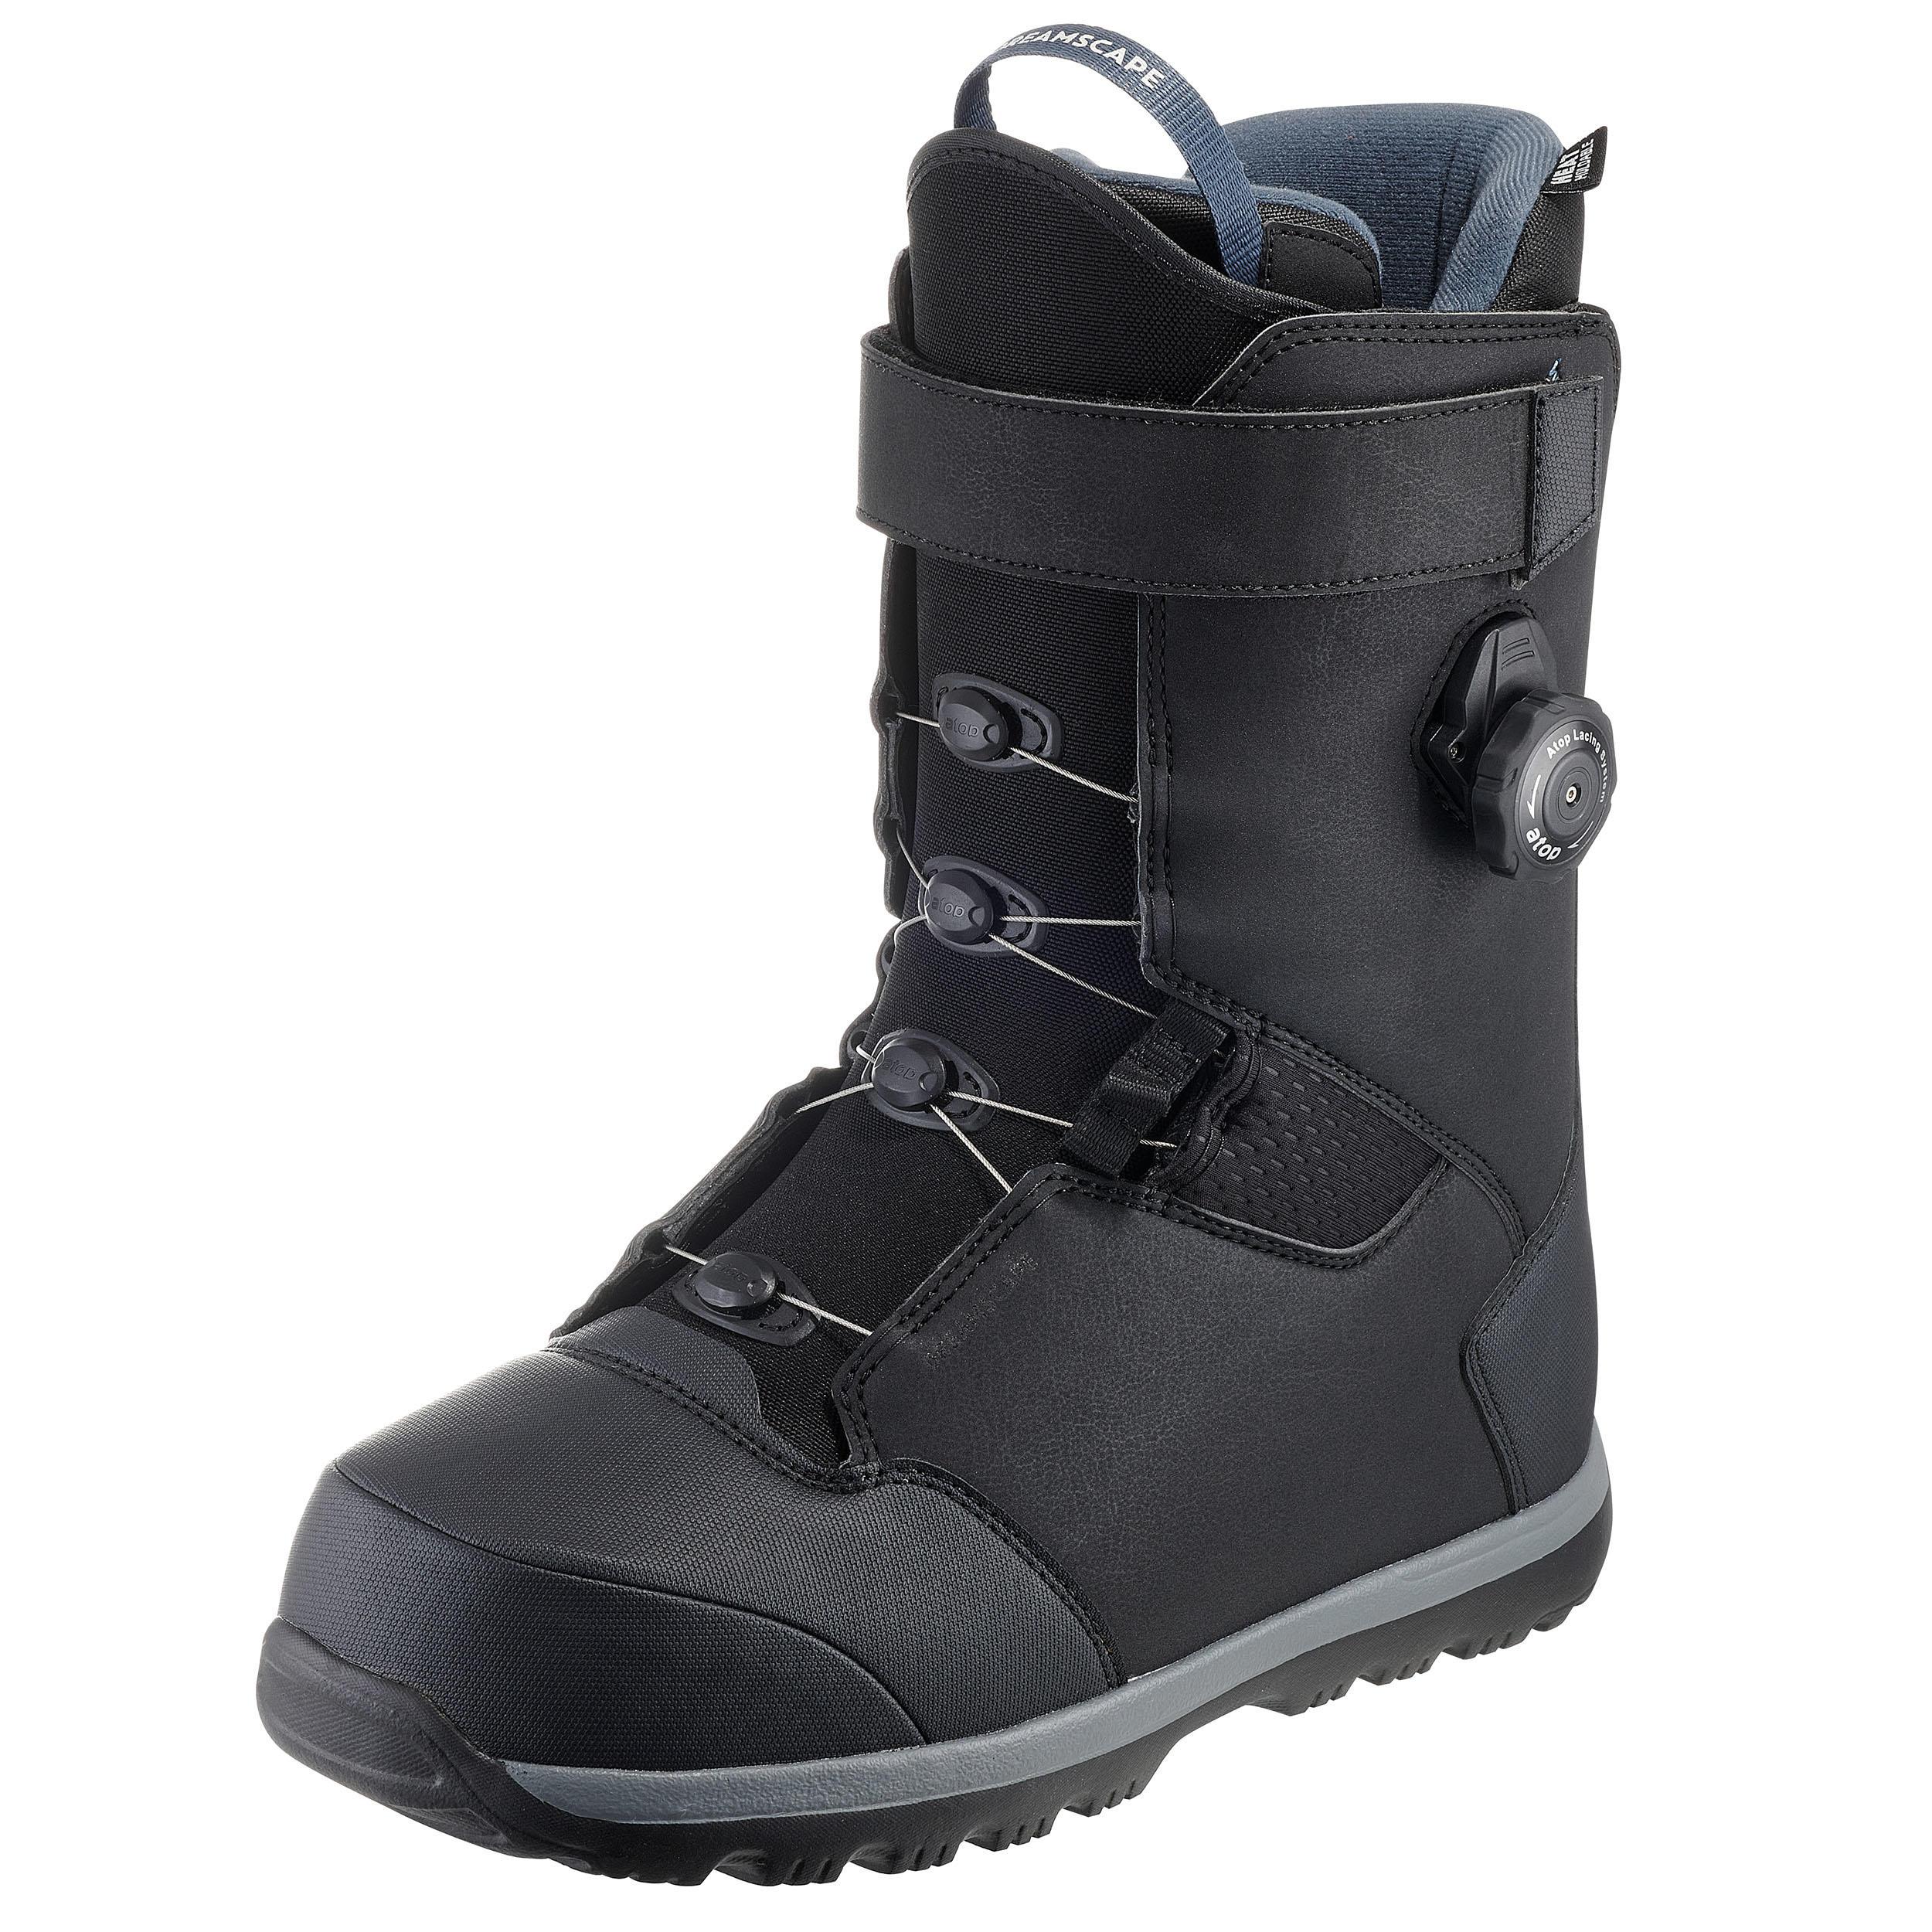 Boots Snowboard All Road 500 imagine